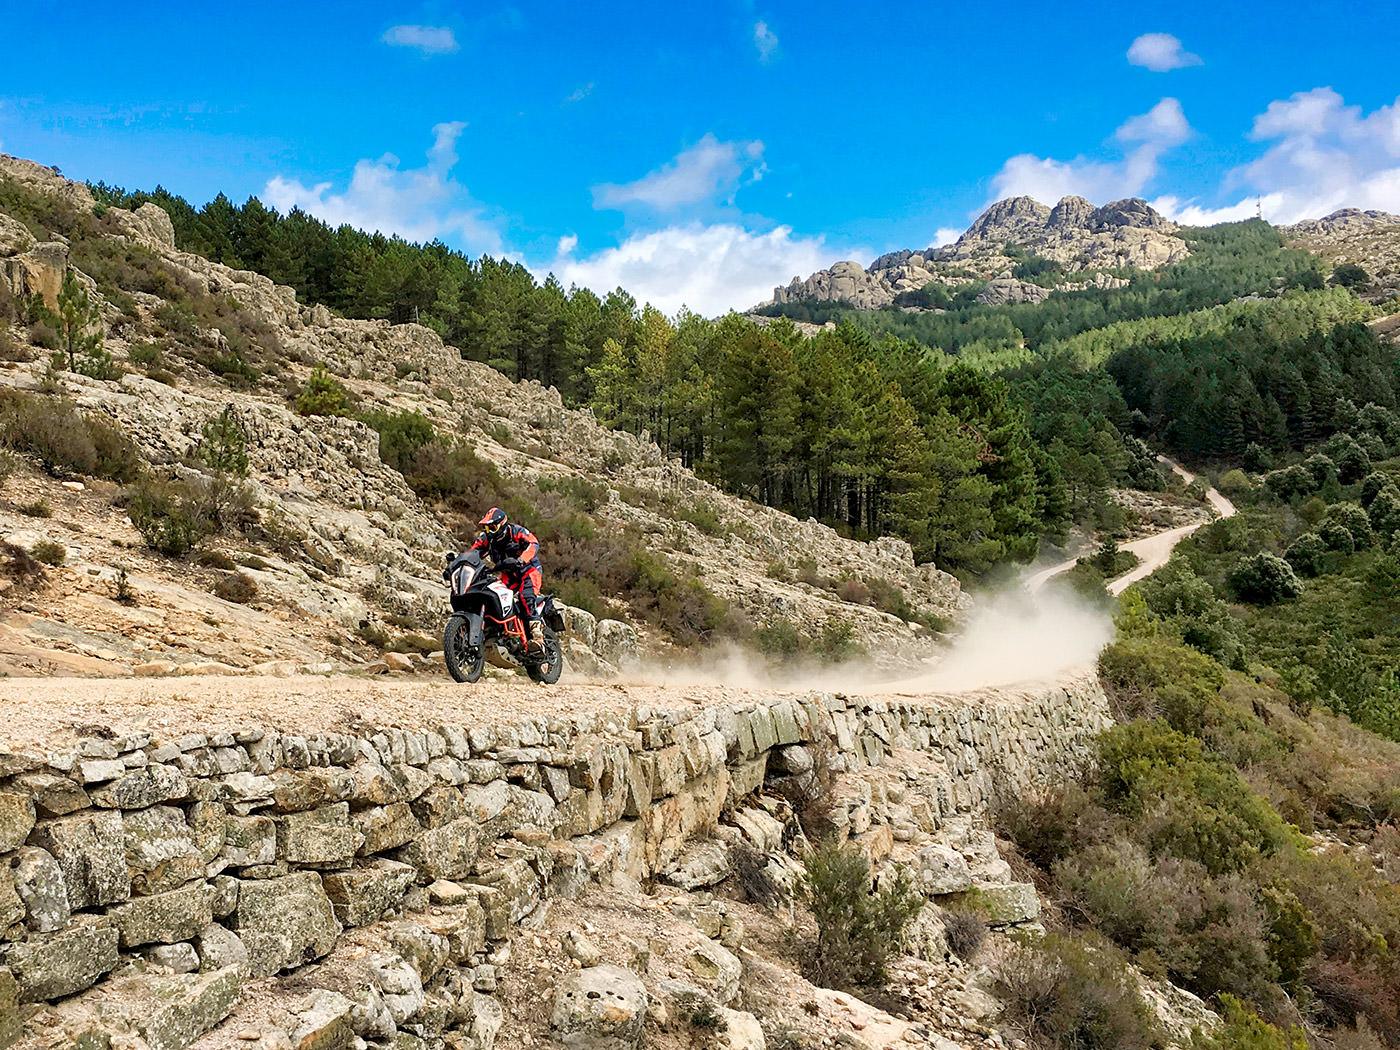 KTM Adventure Rally 2018 in Sardegna